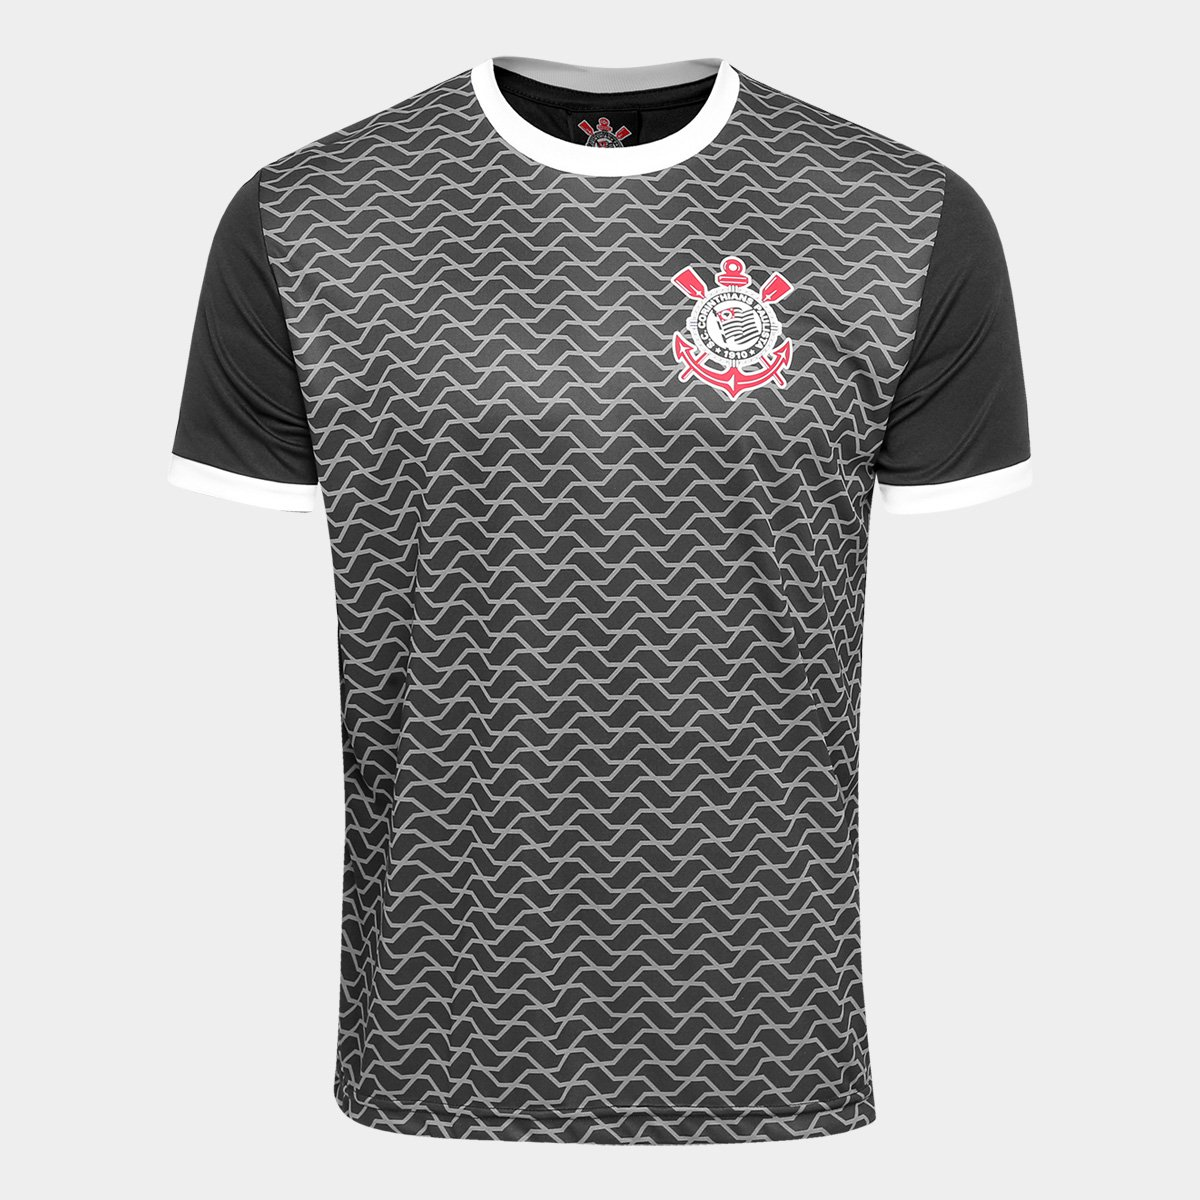 63811321cf172 Camisa Corinthians Libertados Masculina - Compre Agora